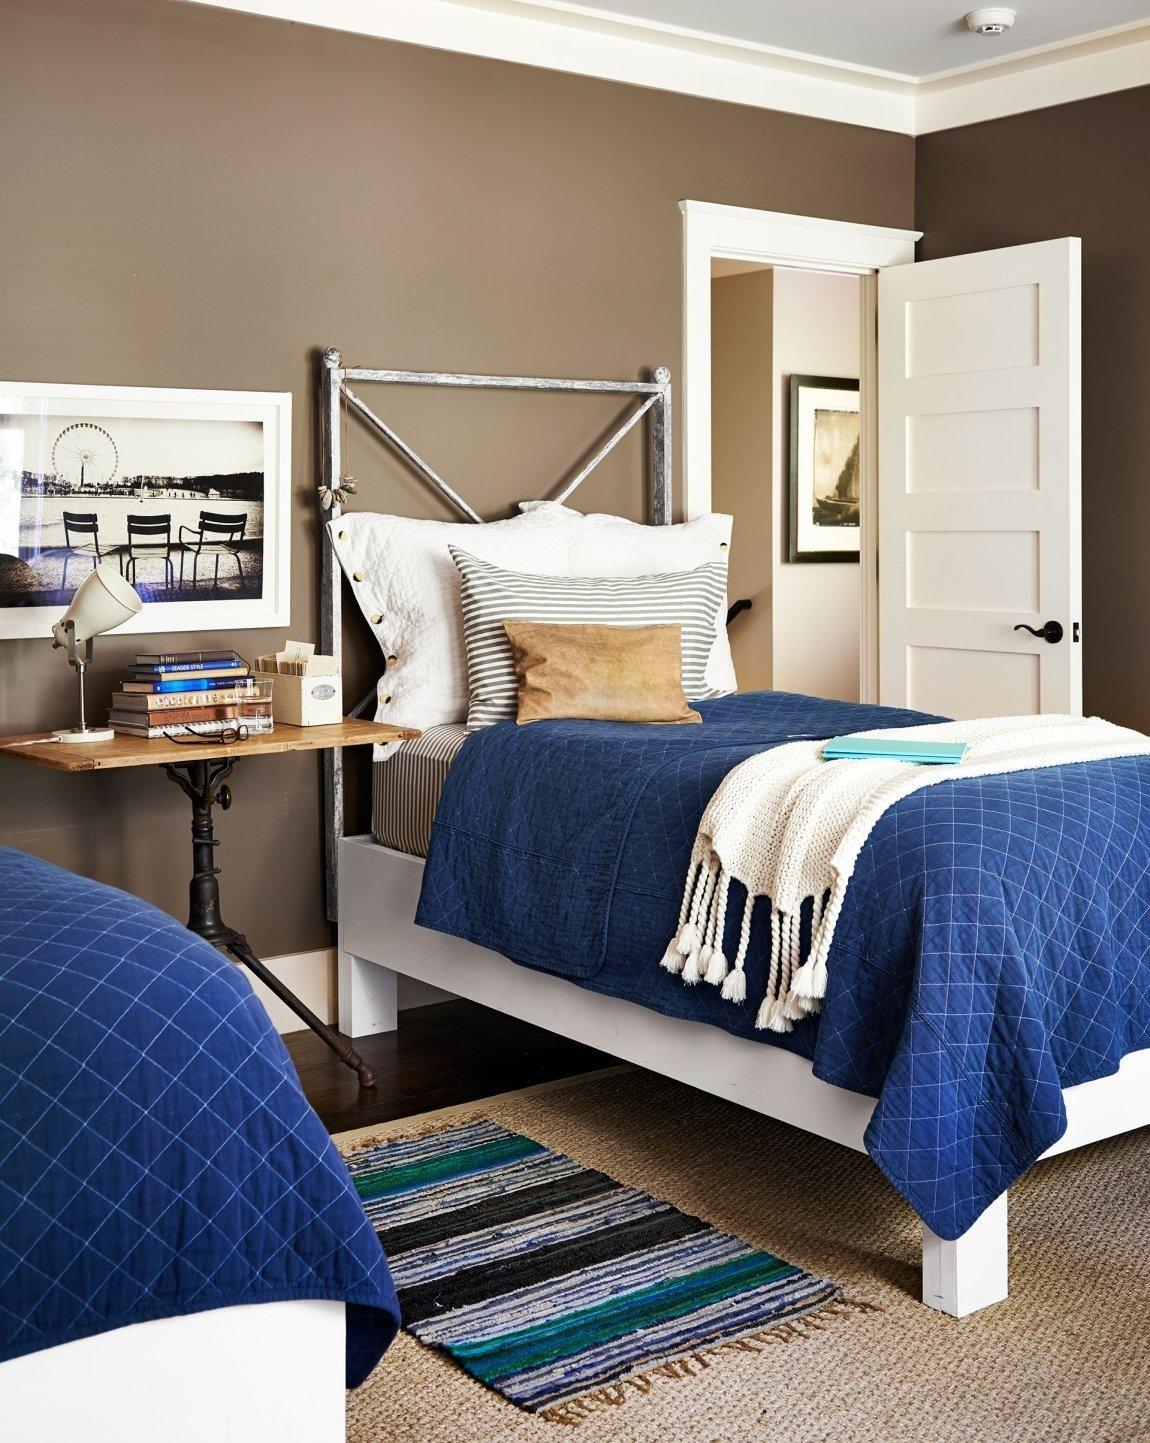 10 Unique Bright Ideas Royal Oak Mi art van clearance center locations gardella furniture detroit mi bar 2021